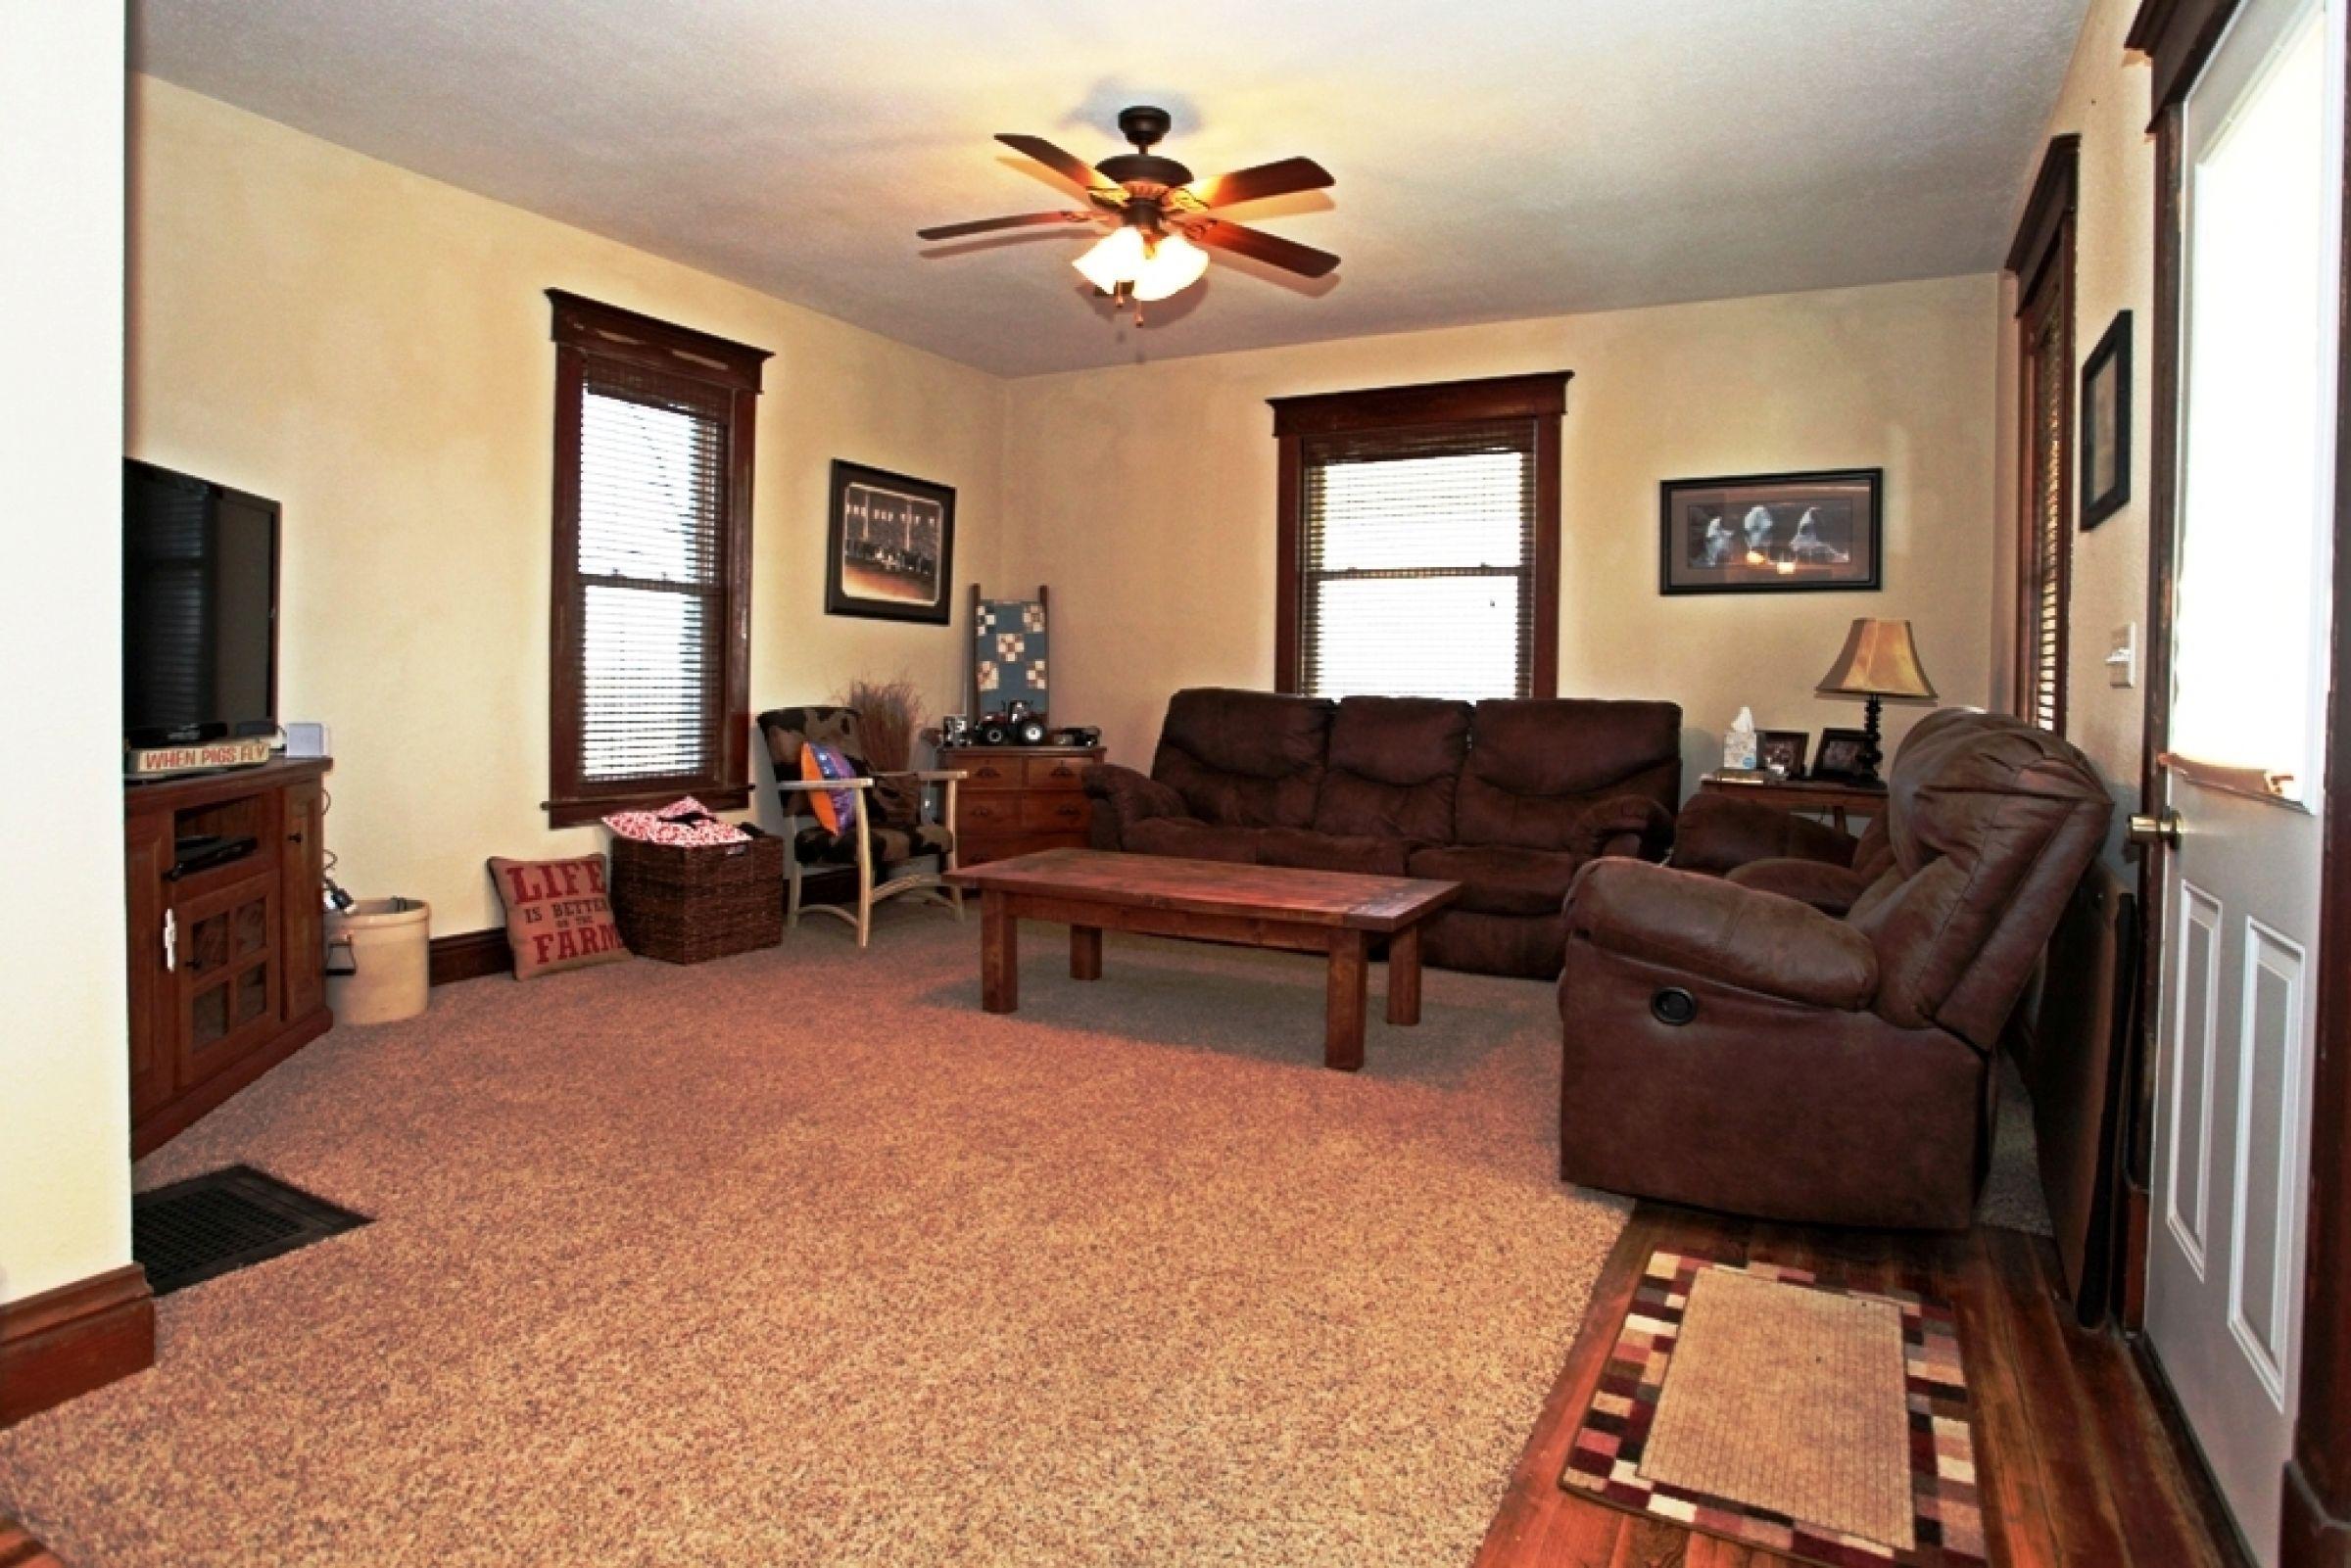 residential-wayne-county-iowa-1-acres-listing-number-15243-9-2020-11-05-200145.JPG